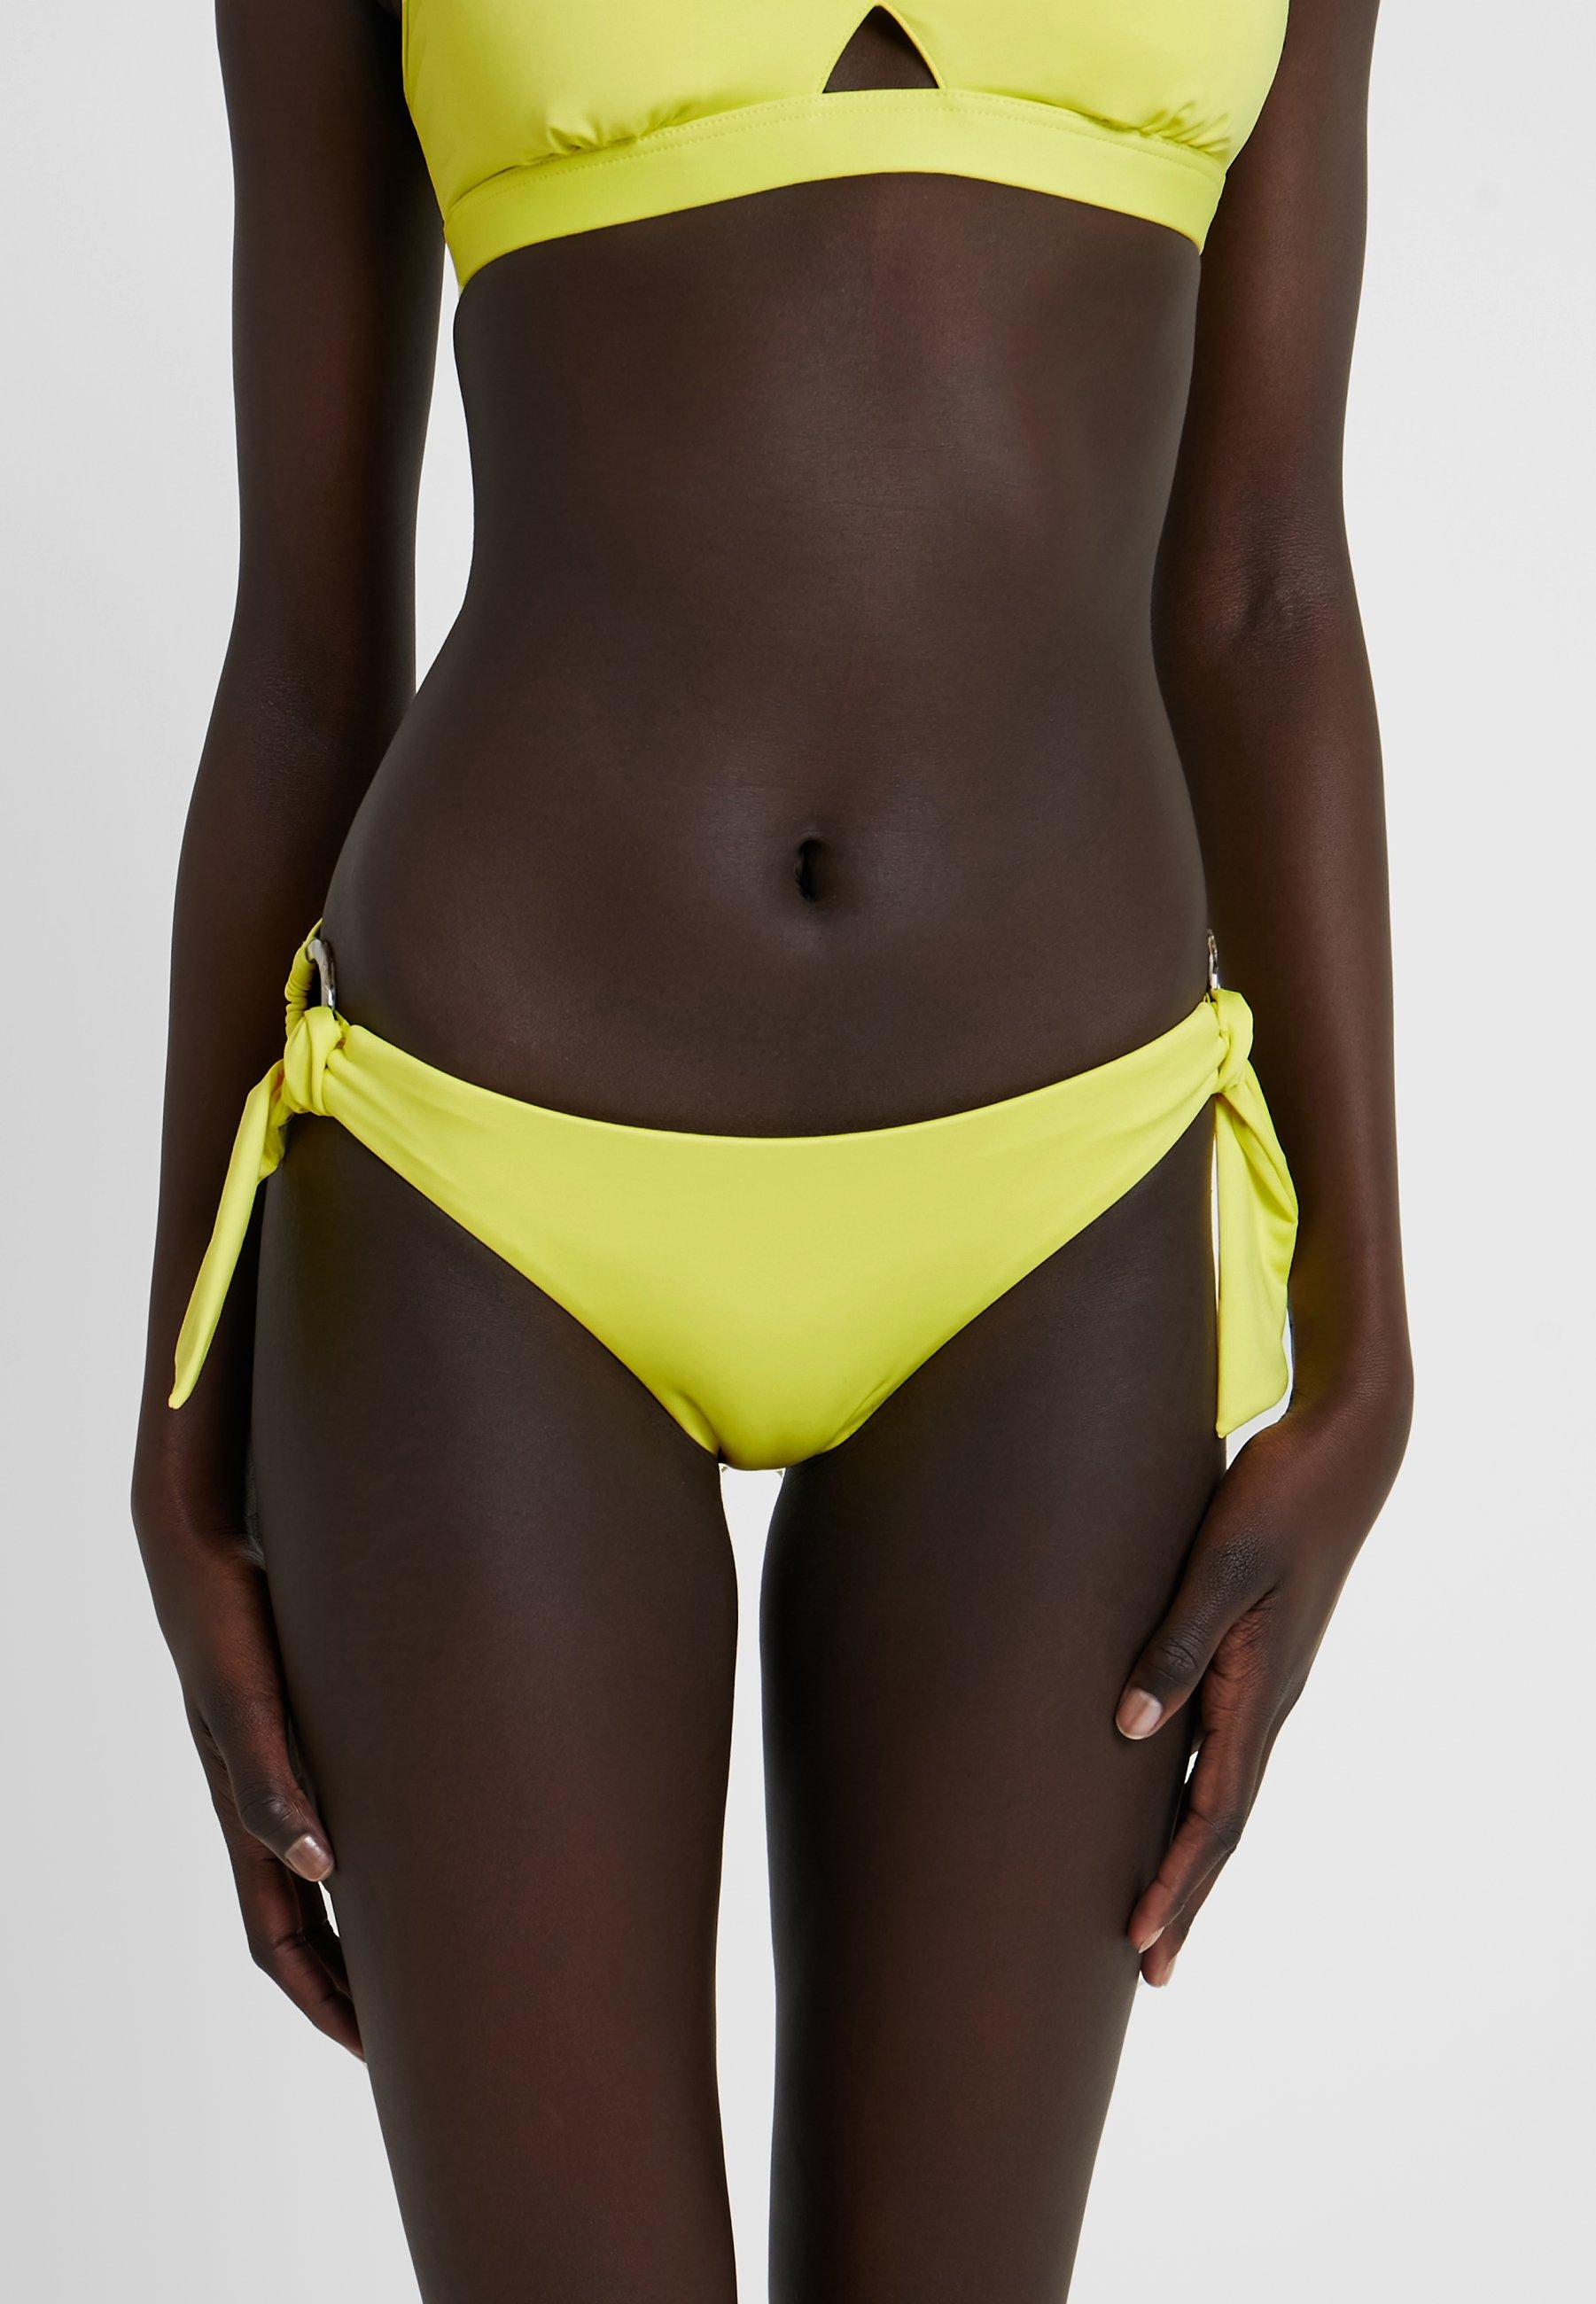 Seafolly Ring De Lime Light Side HipsterBas Bikini Active wOPN80ymnv